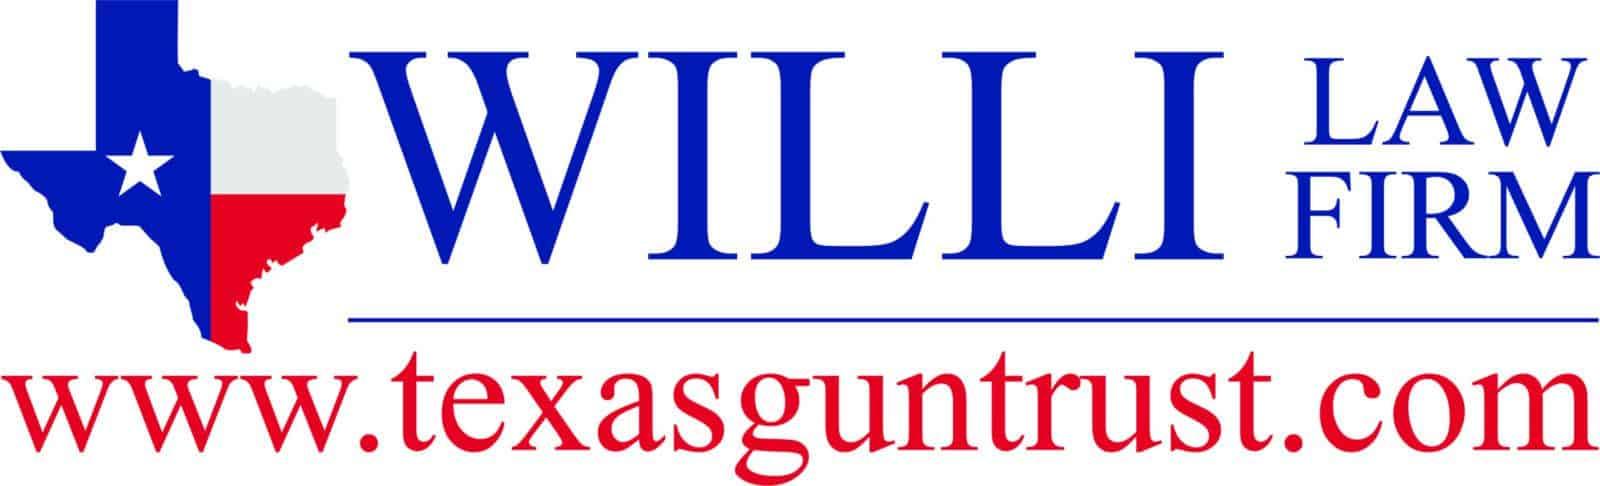 Texas Gun Trust Attorneys Icon